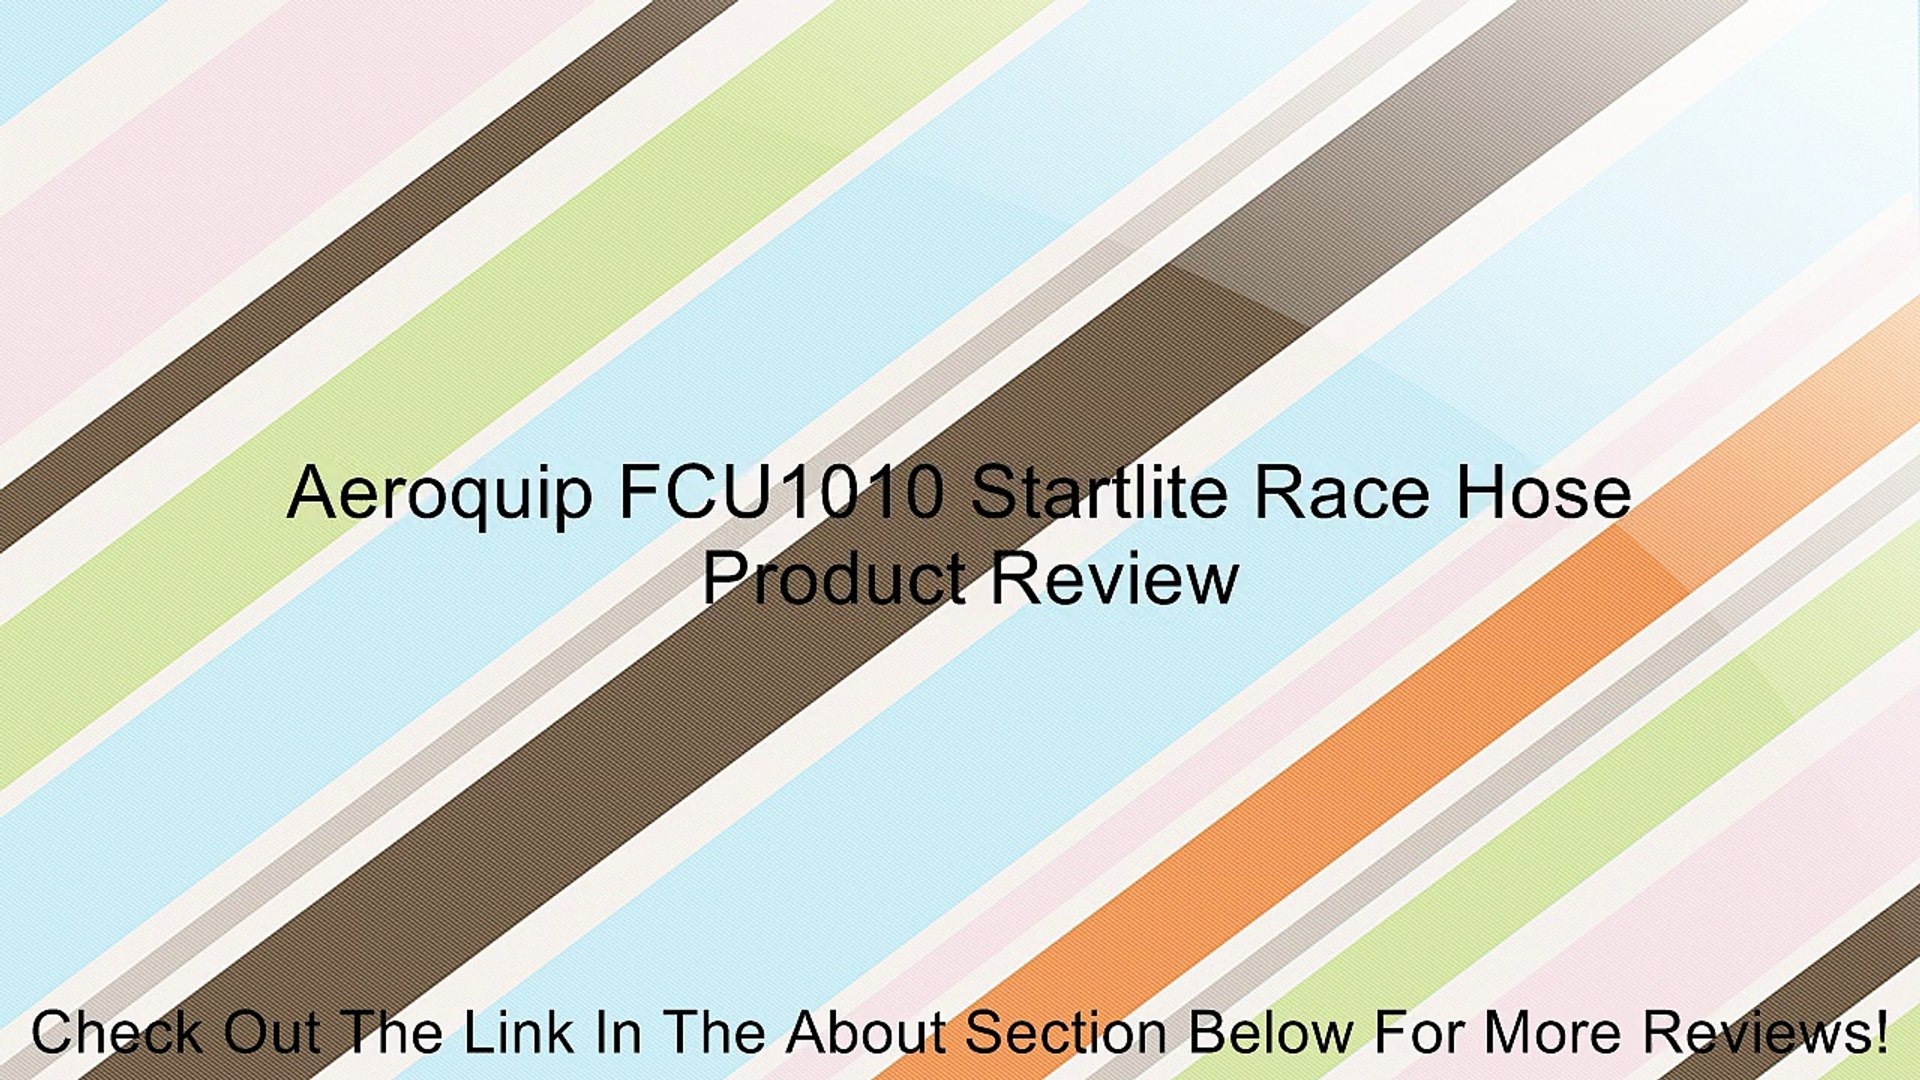 Aeroquip FCU1010 Startlite Race Hose